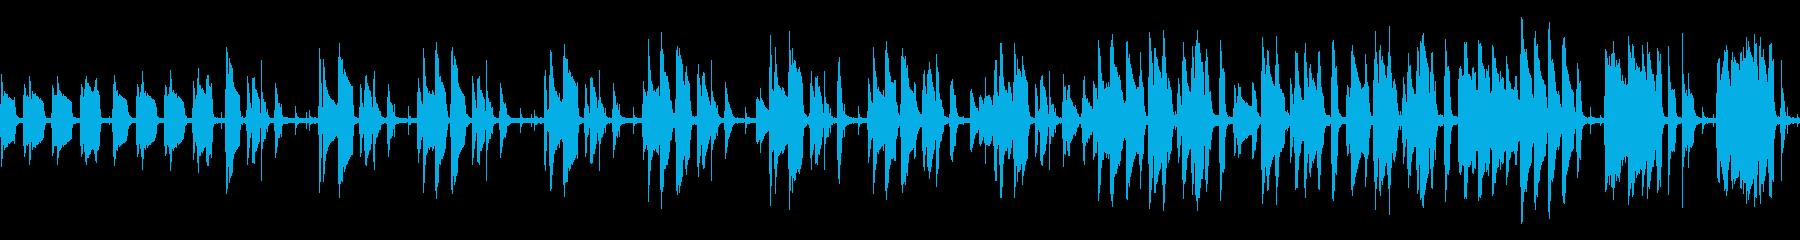 jazz系BGM(ループ仕様)の再生済みの波形